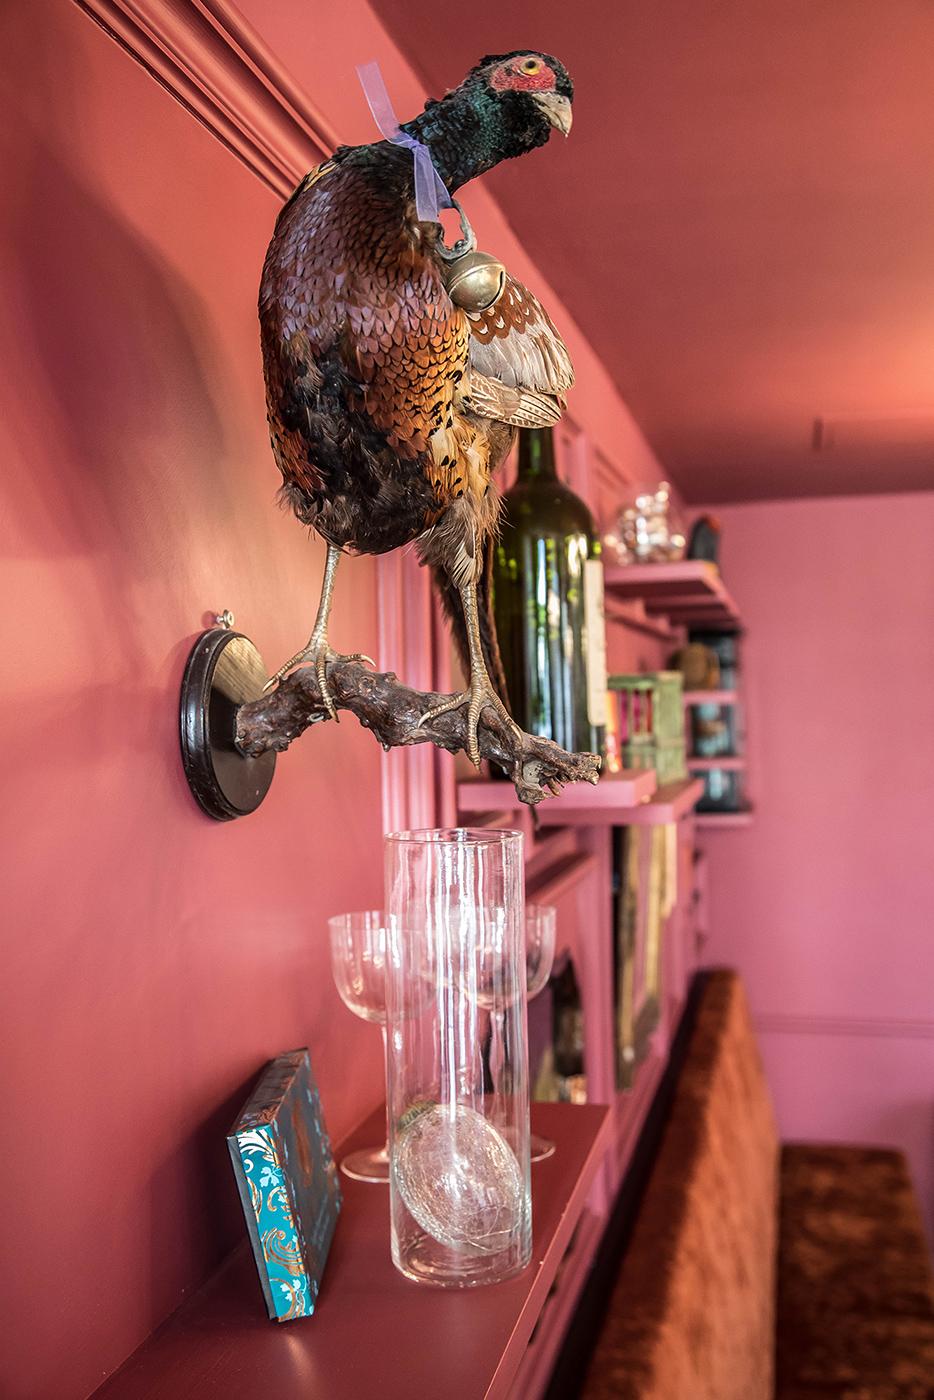 cafe-oulala-close-bird.jpg